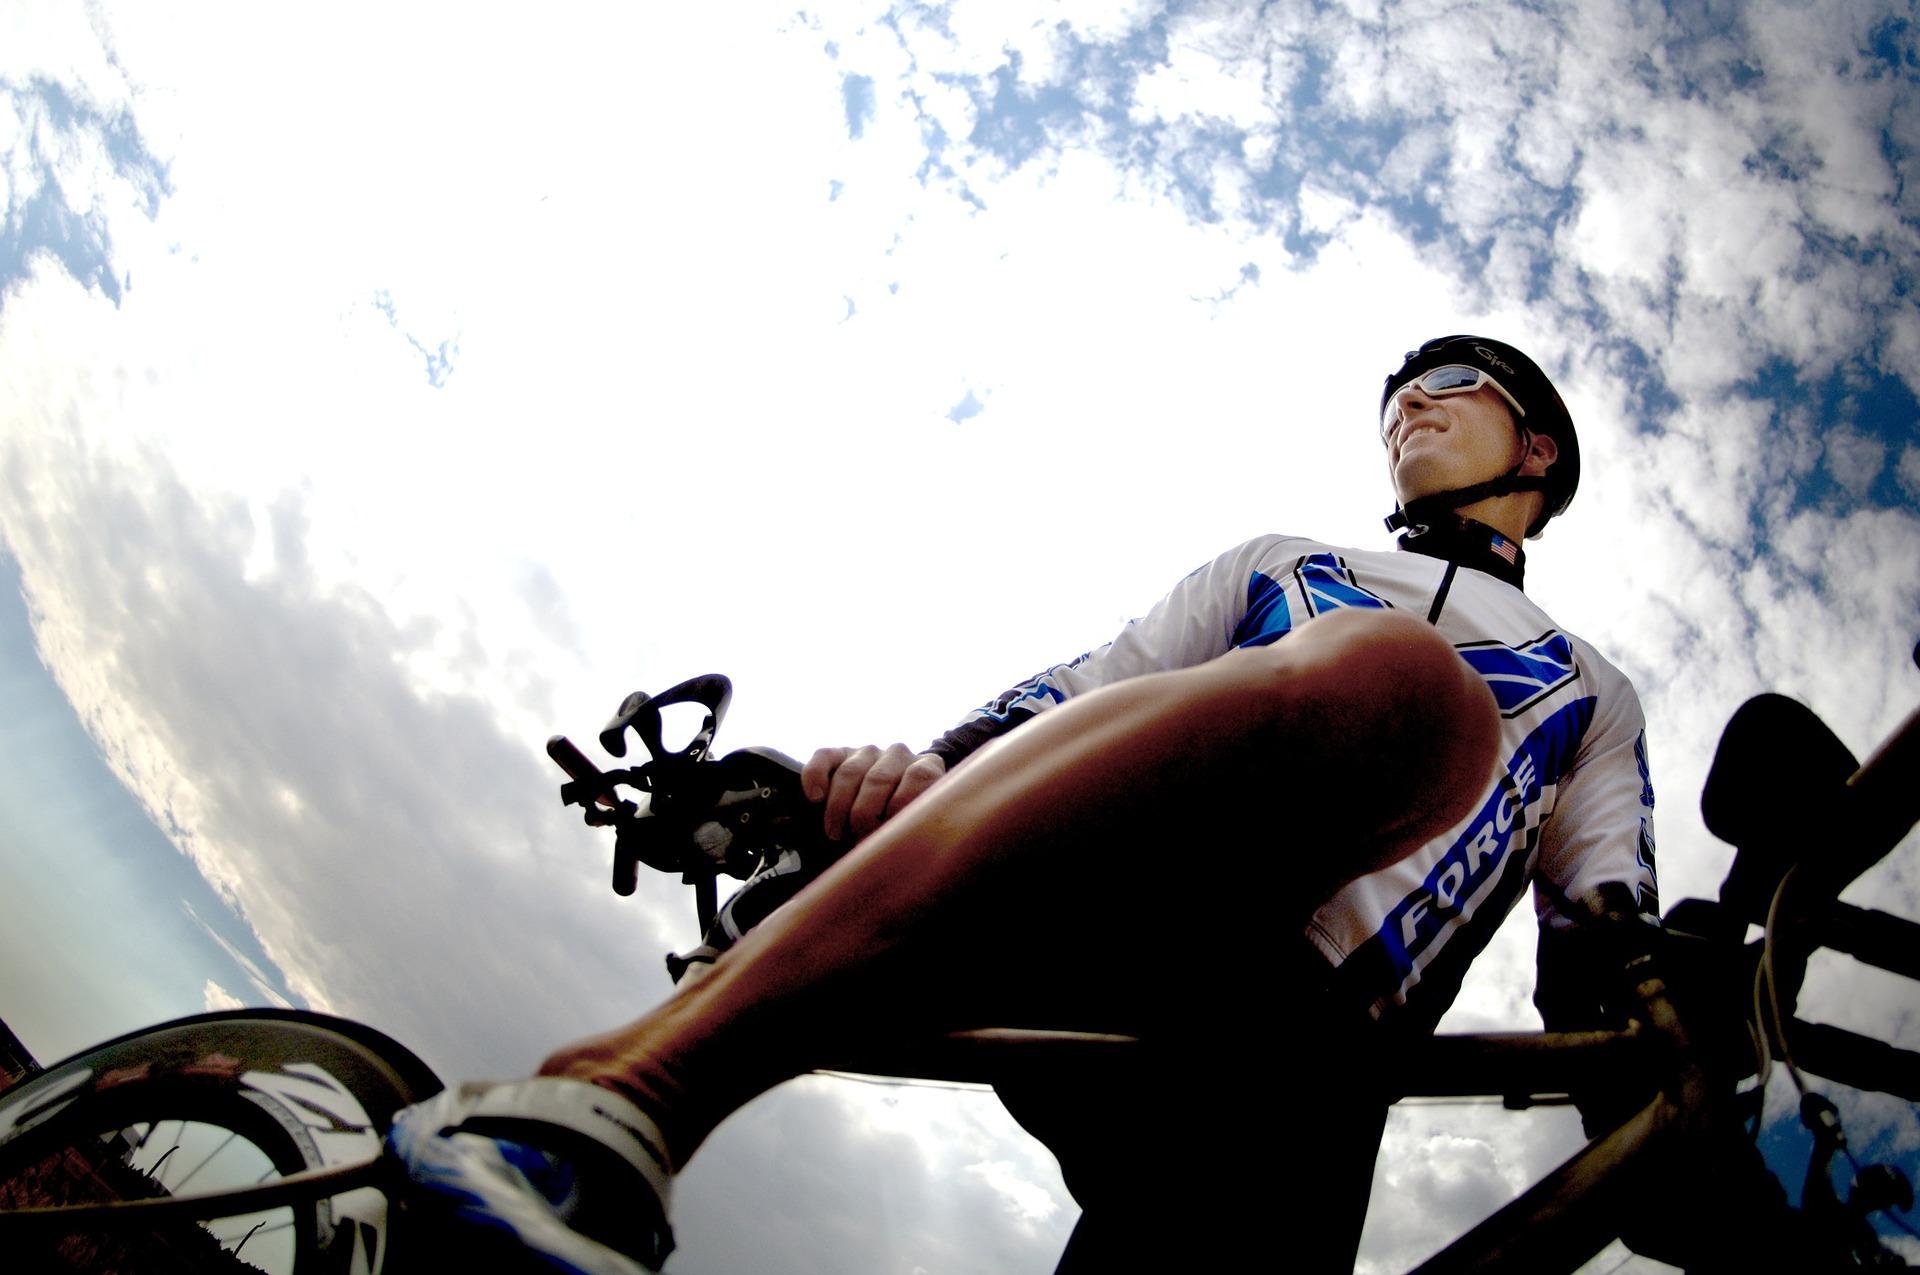 Discovery 947 Ride Joburg 2019